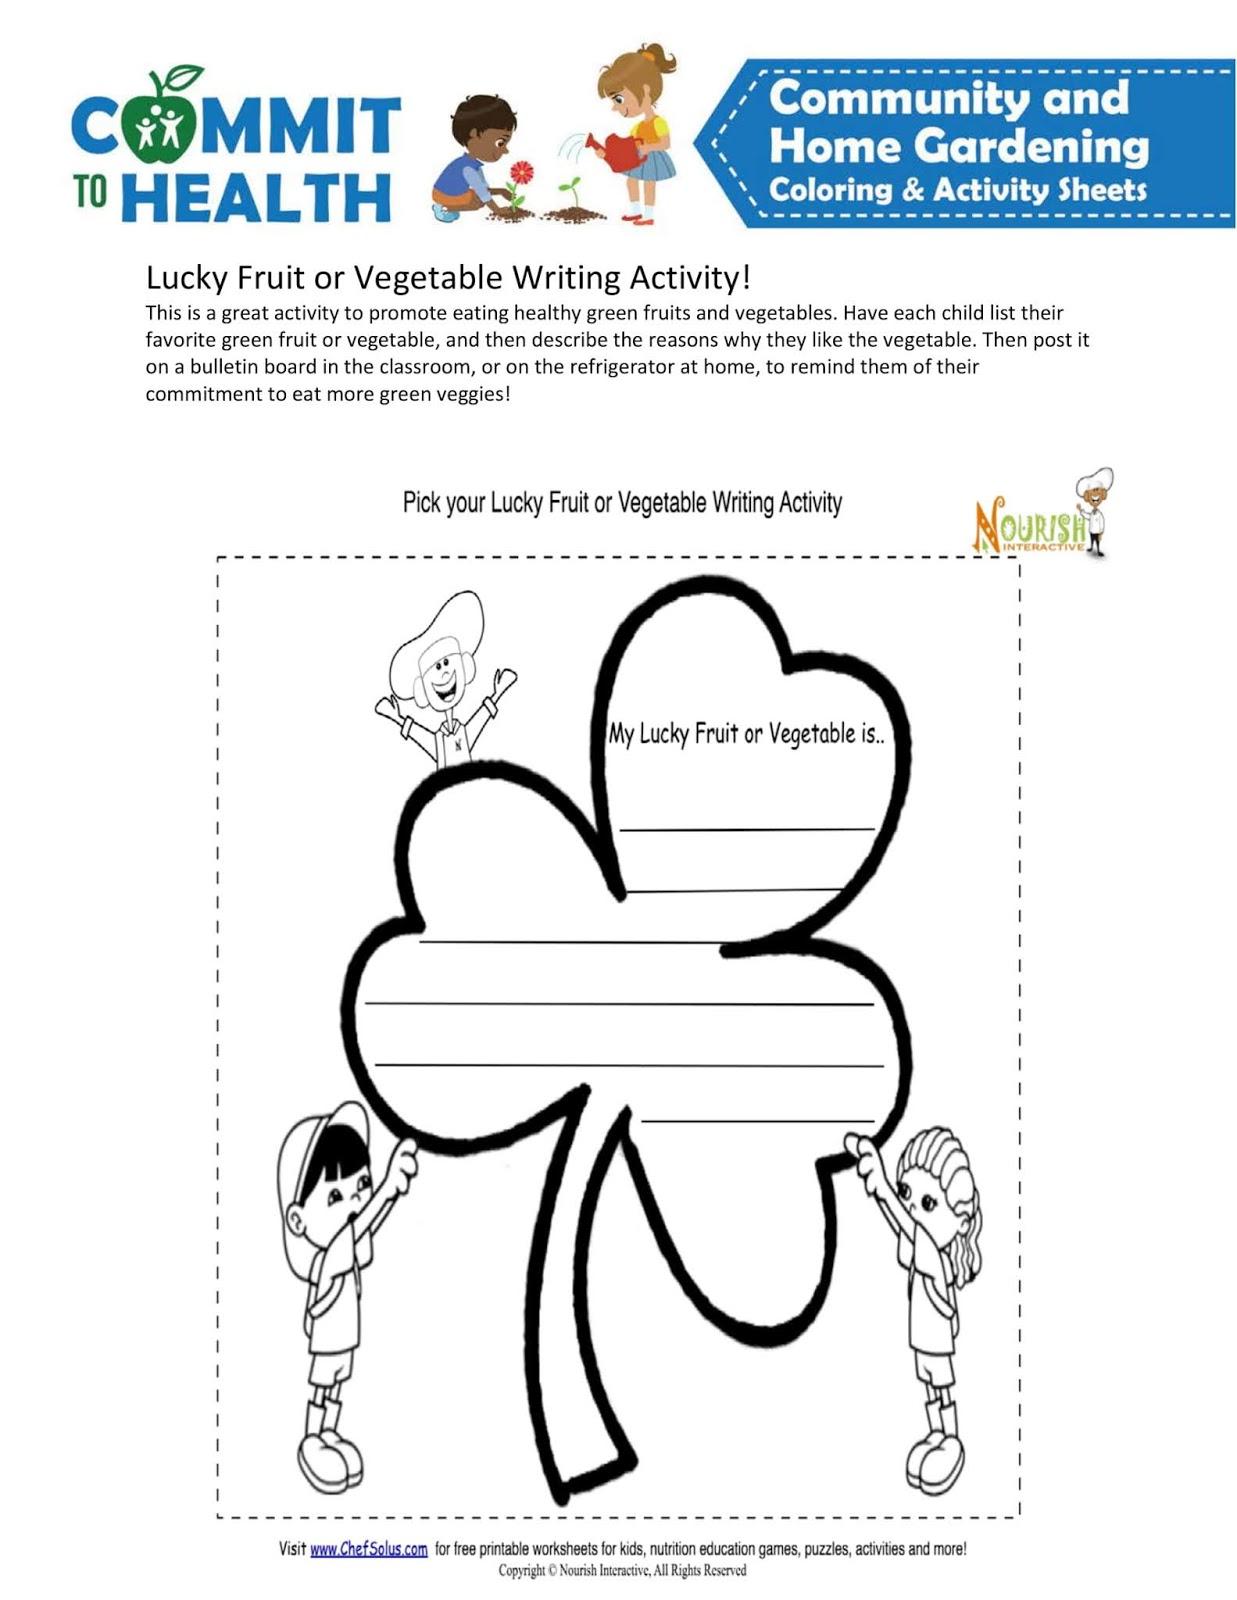 medium resolution of March coloring activity sheets gardening community home grades 3-5 -  Raste-enblog2